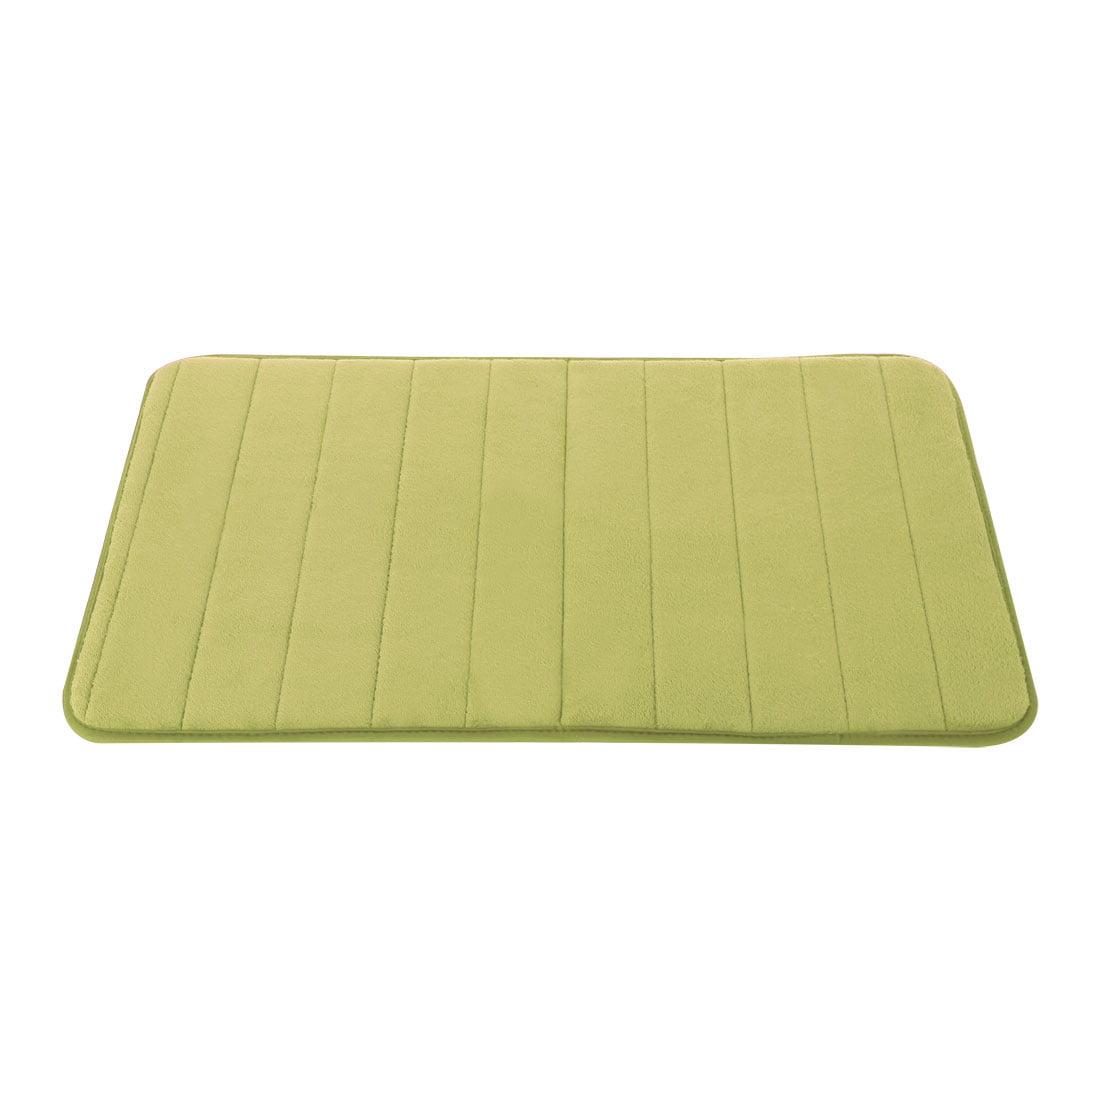 Memory Foam Bathroom Rugs Absorbent Bath Floor Mat Green